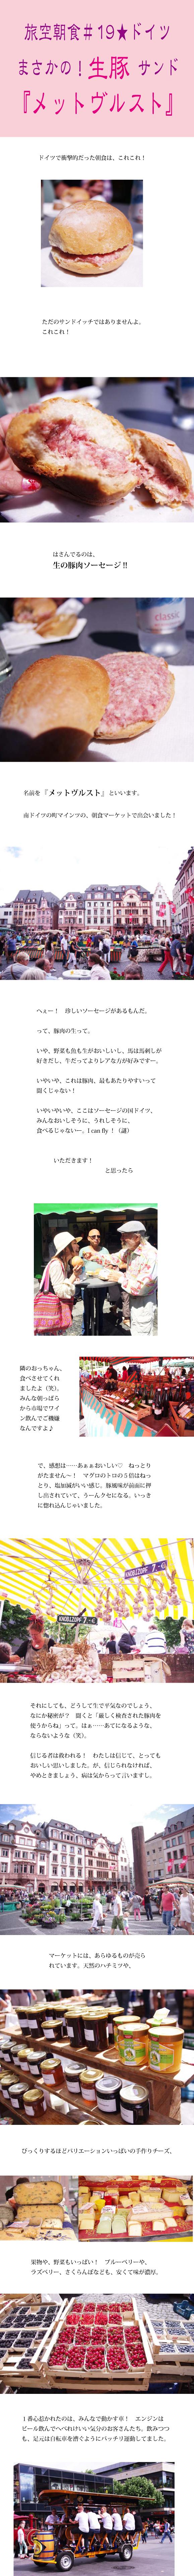 tomako170419.jpg